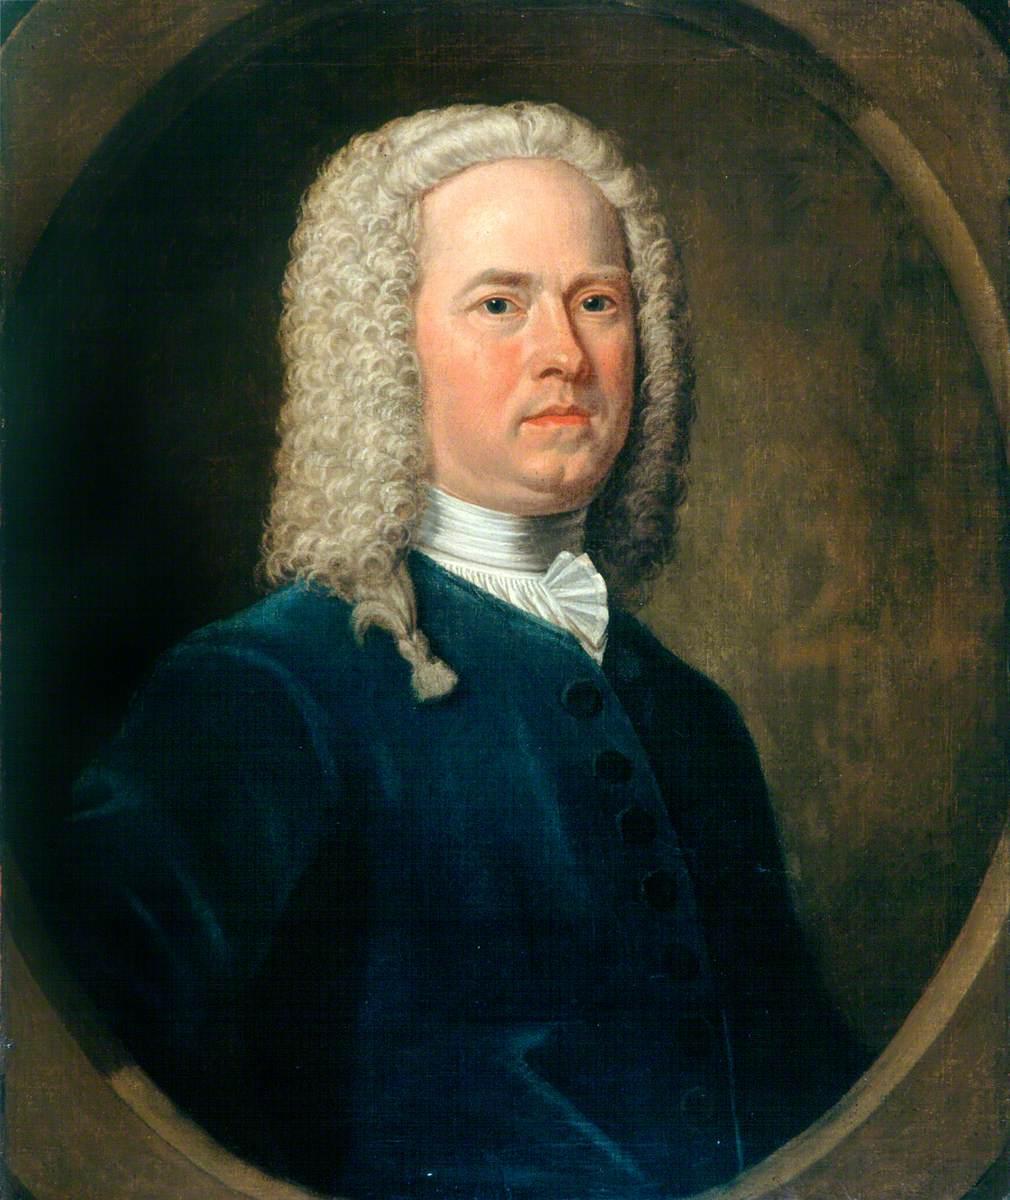 William Chalmers of Westburn, Provost of Aberdeen (1738–1739 & 1746–1747)